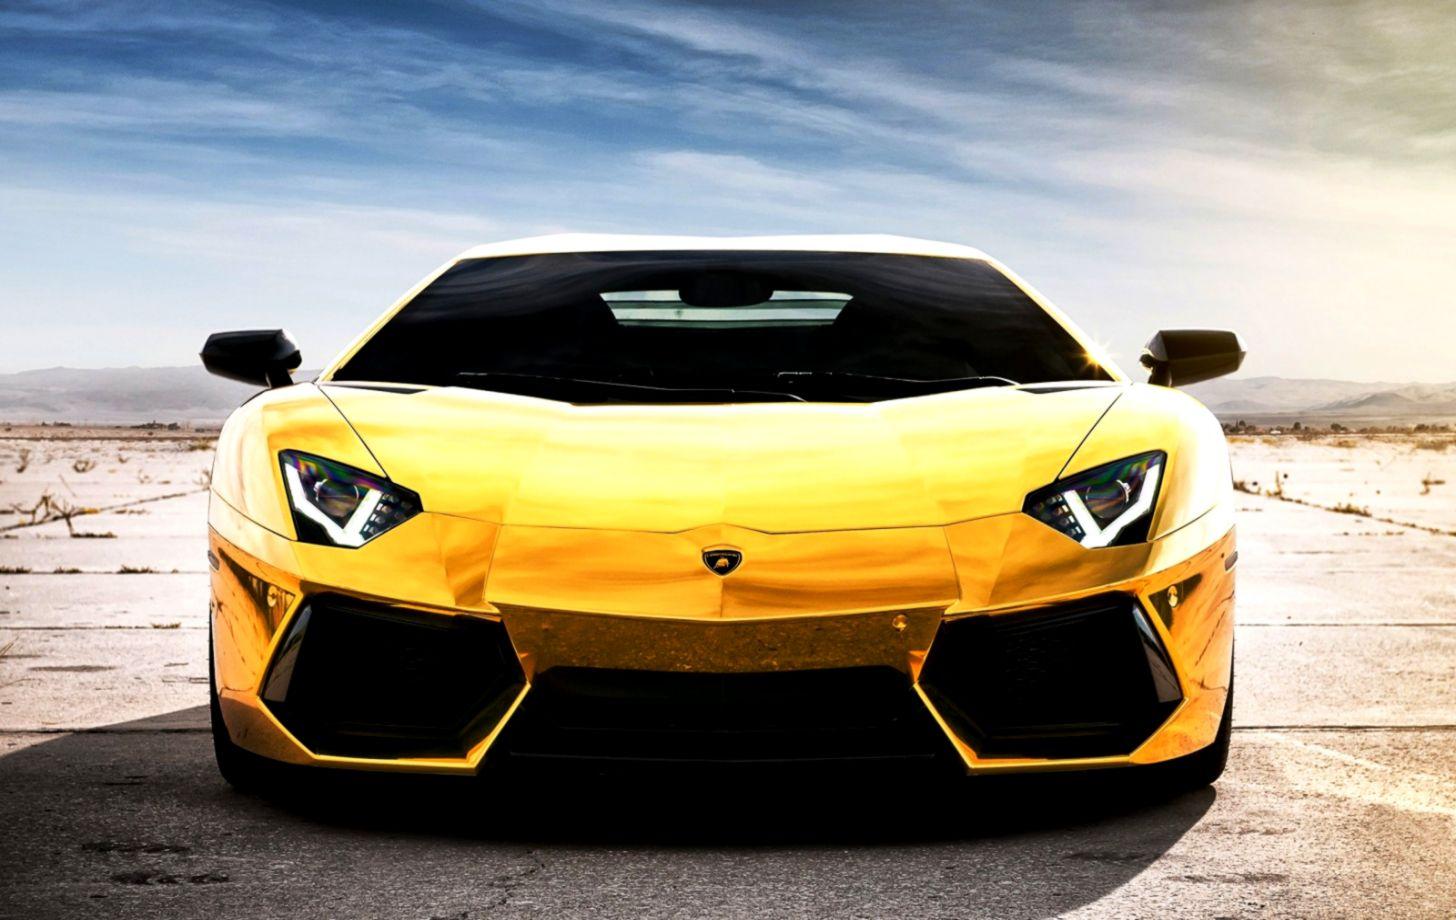 Super Car Lamborghini Wallpaper Hd Wallpapers Mhytic